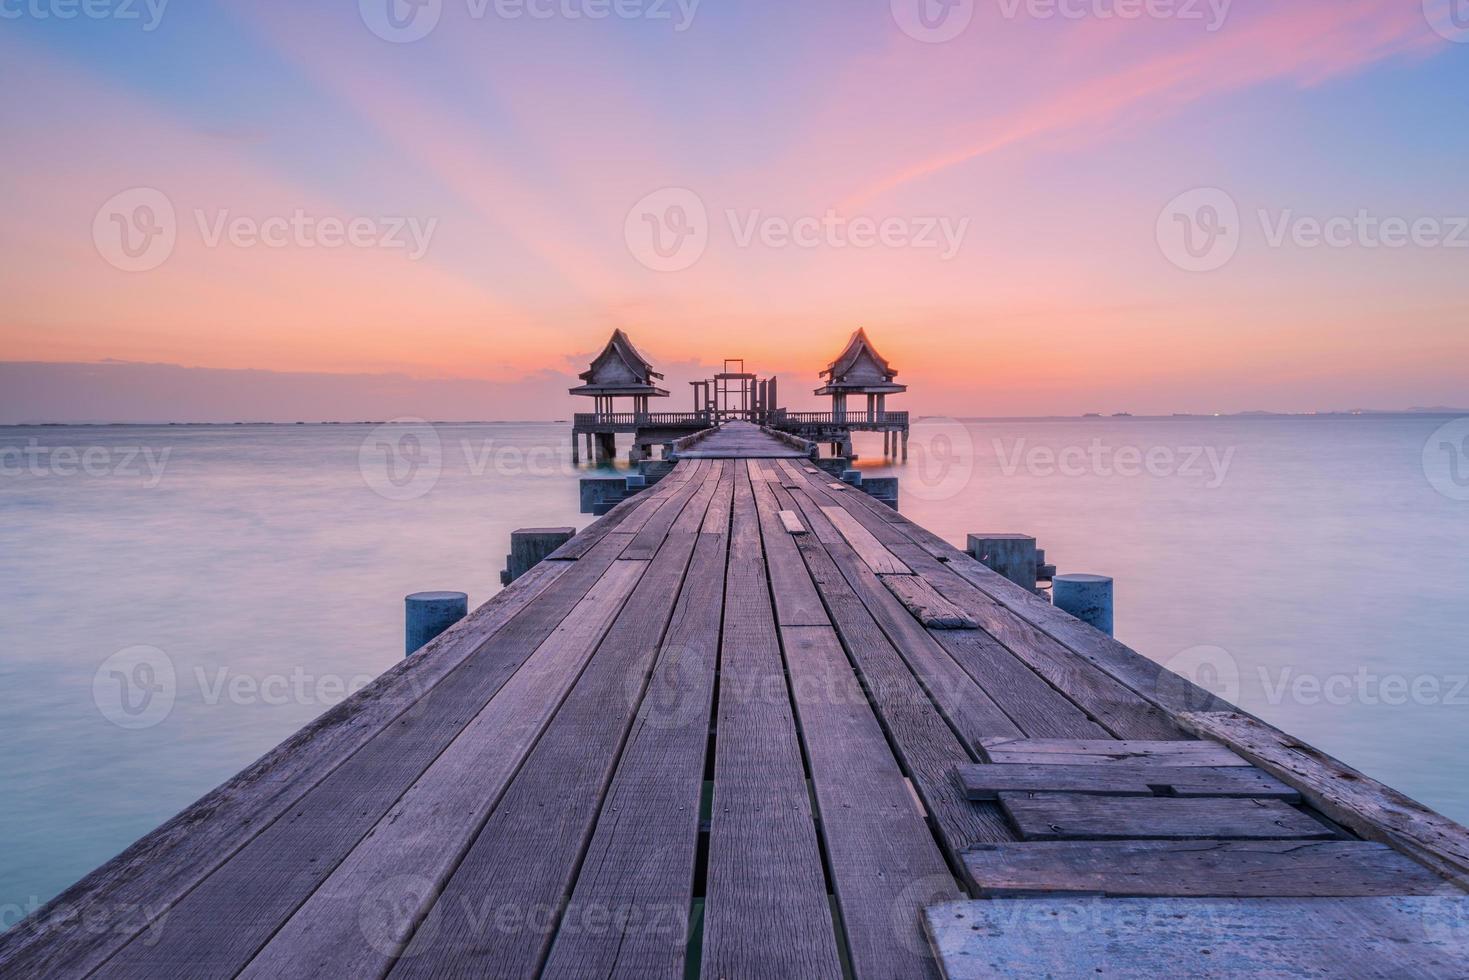 Wooded bridge photo